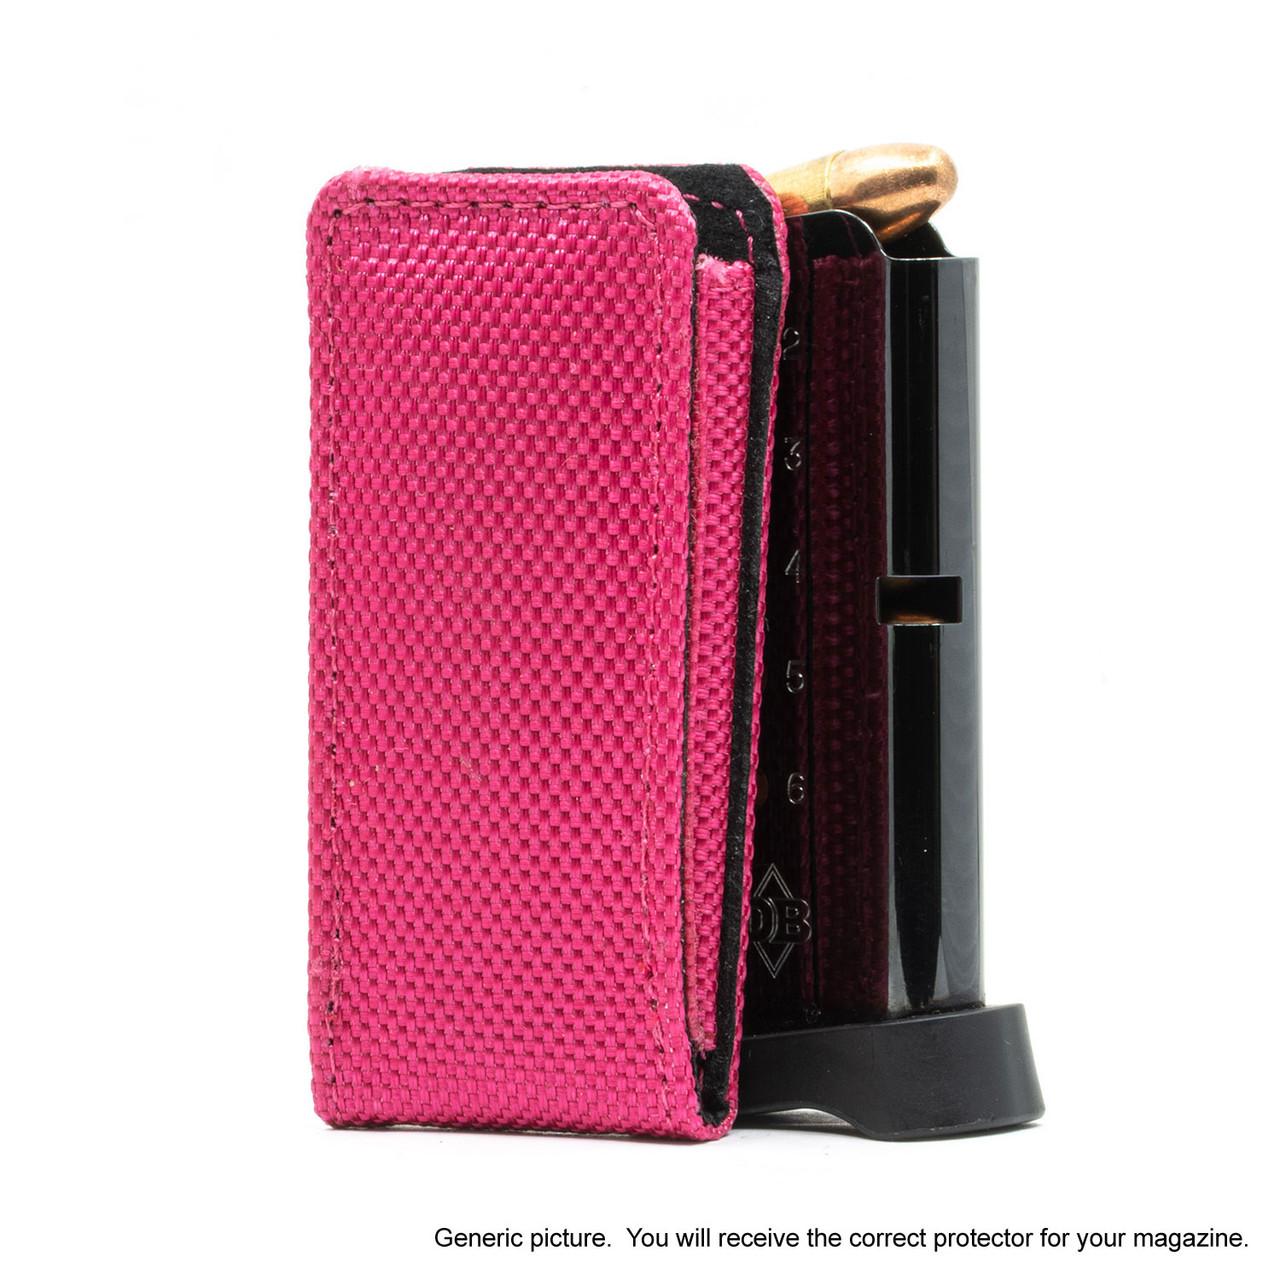 CZ 2075 Rami Pink Covert Magazine Pocket Protector